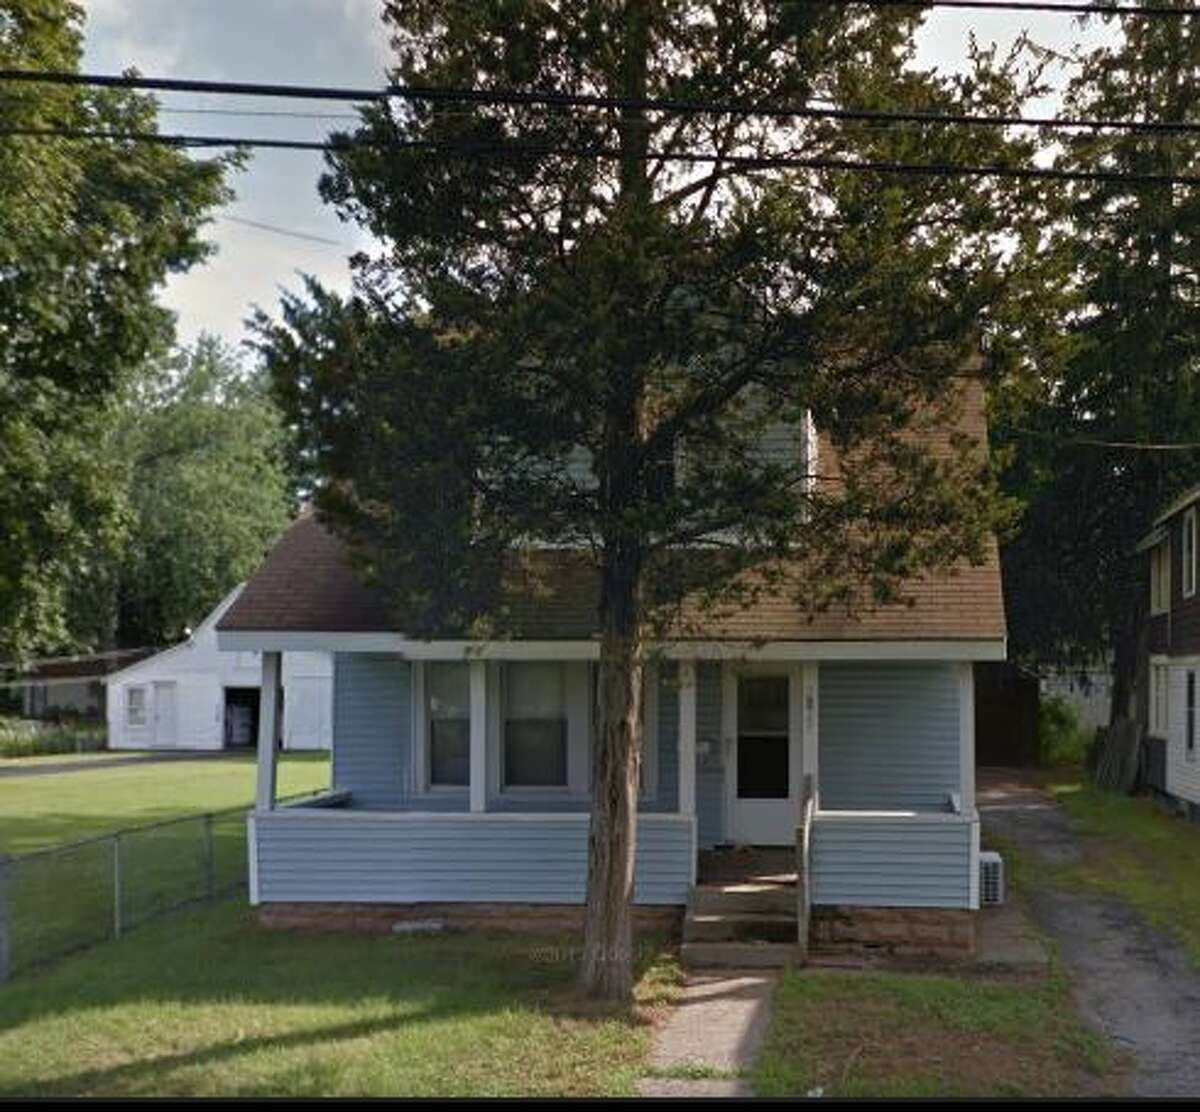 2827 Albany St., Schenectady, $22,000 (Google Maps)